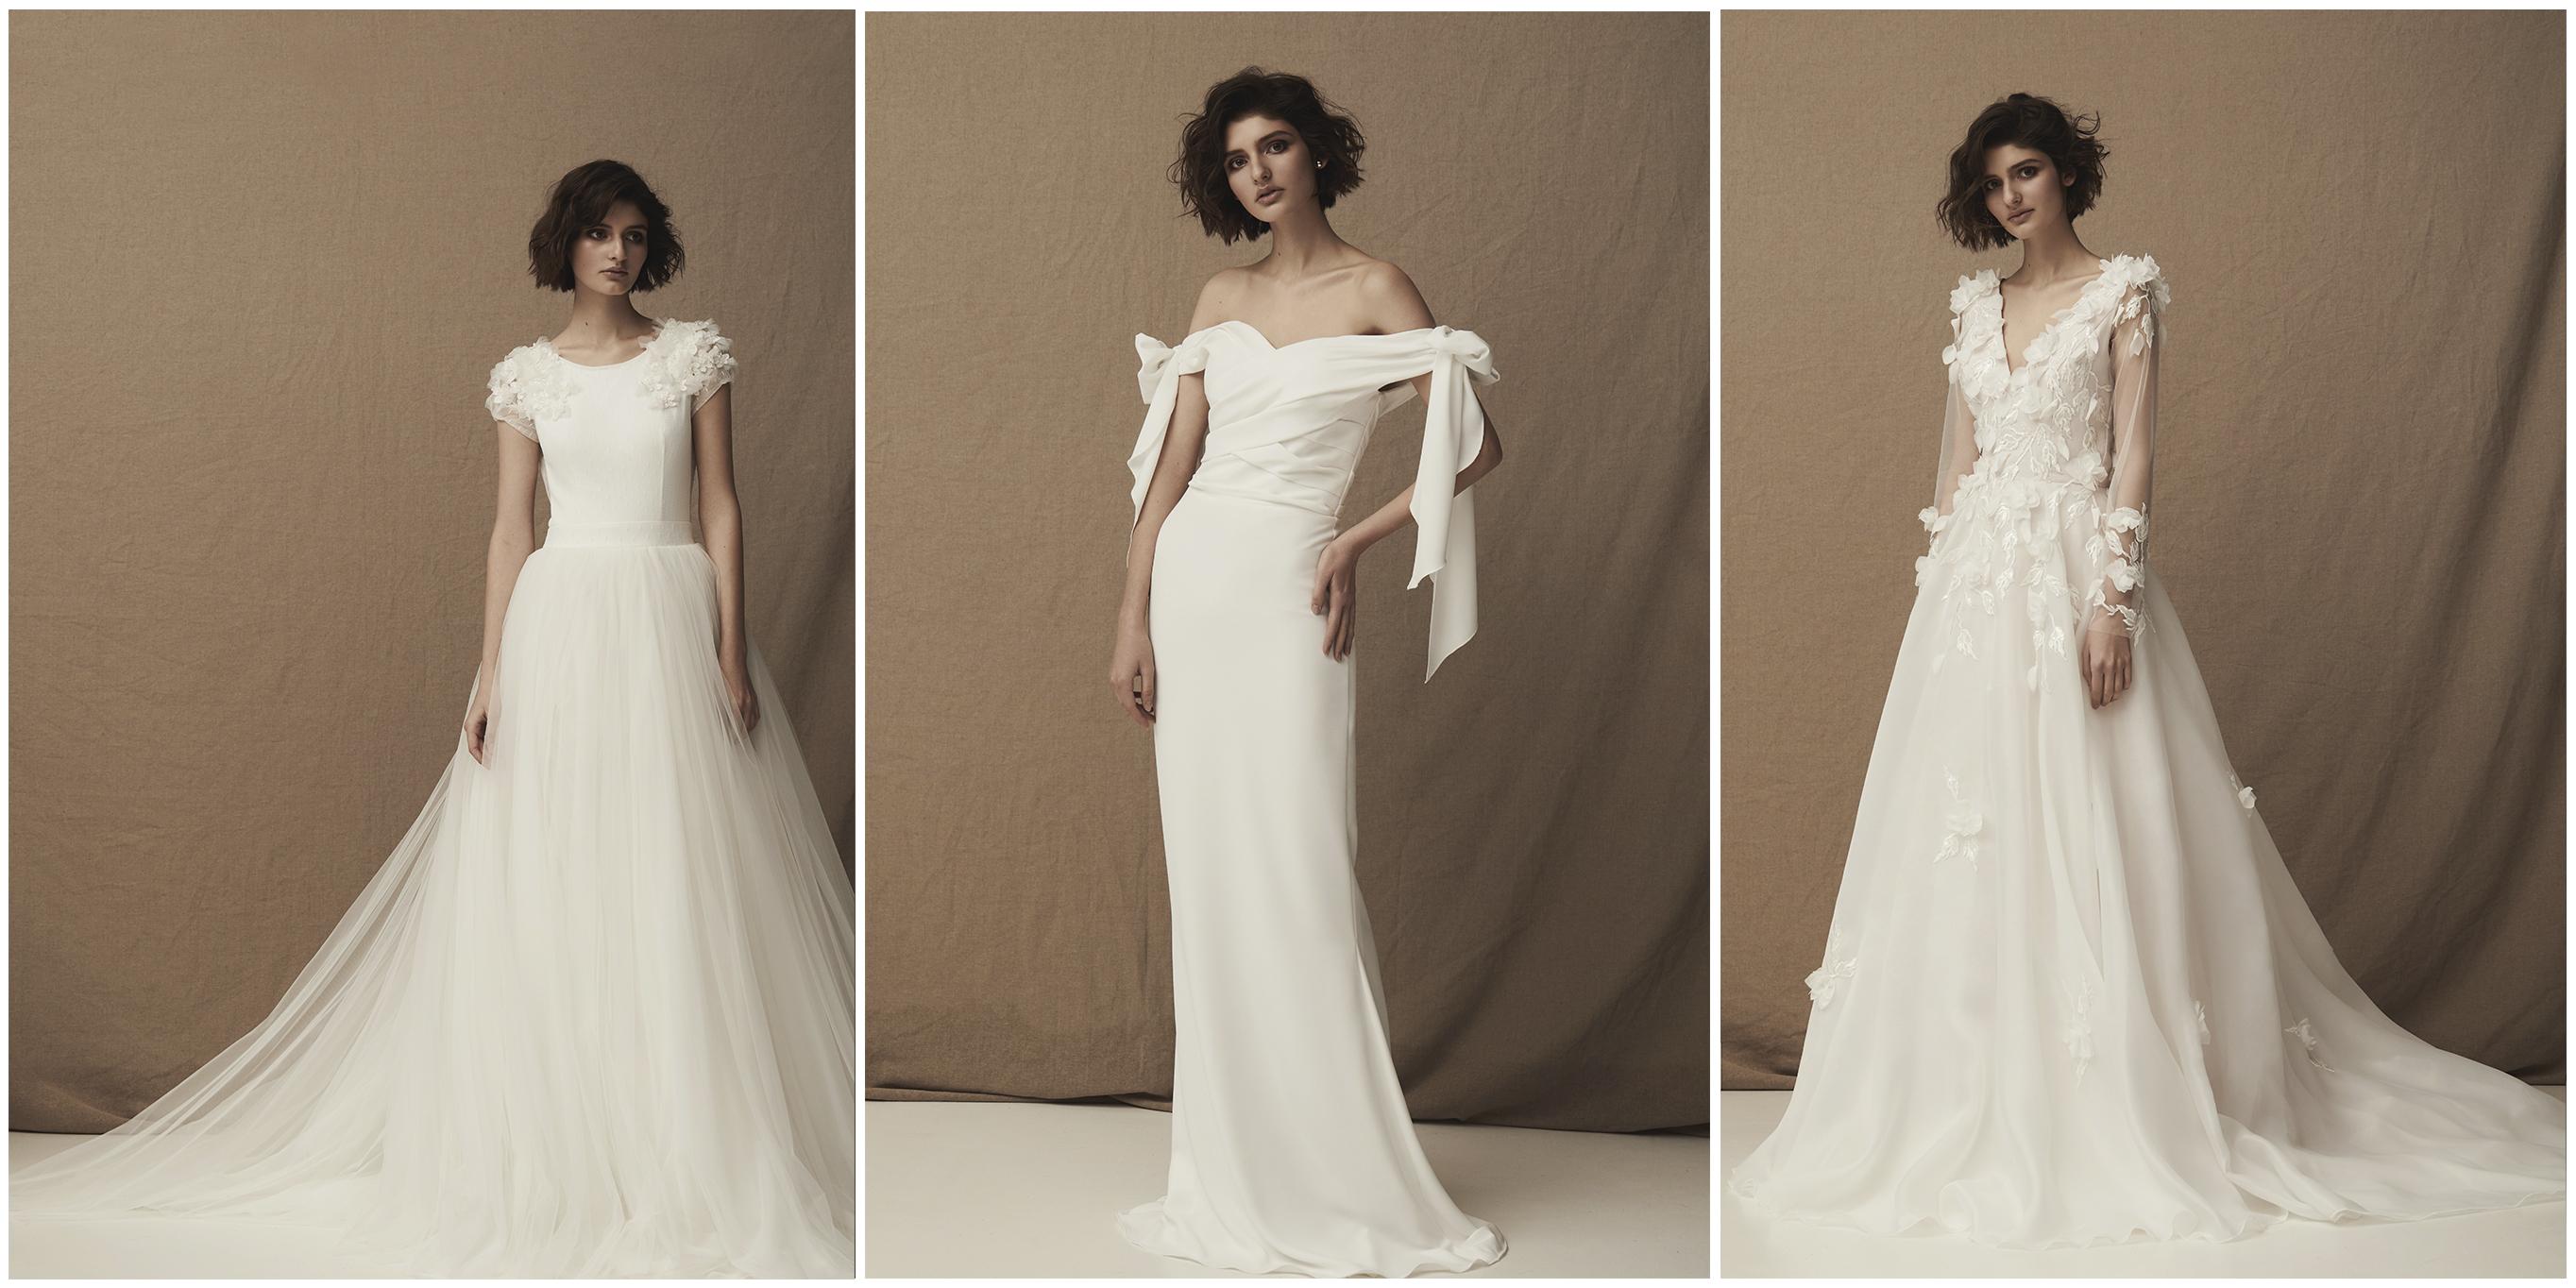 03d079d76c4 bridal коллекции свадебных платьев Feelings. Total White - FEELINGS - 10